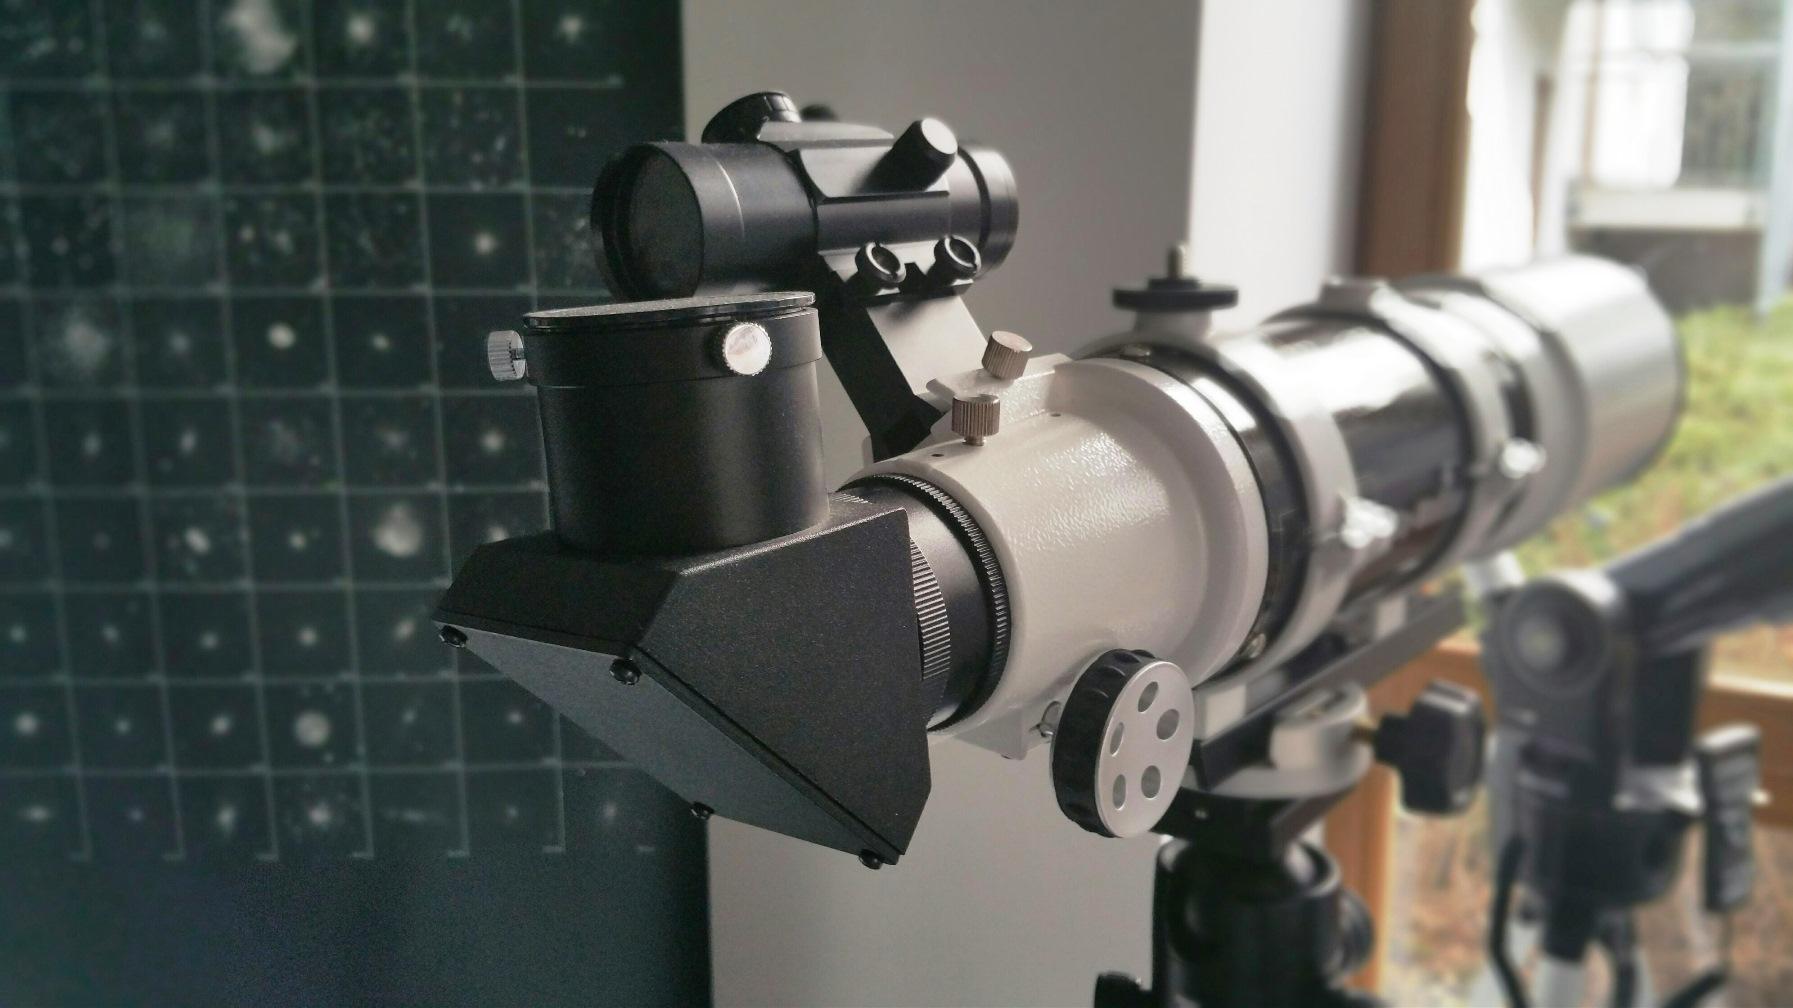 Teleskop für Deep Sky & Planenten am Rande München